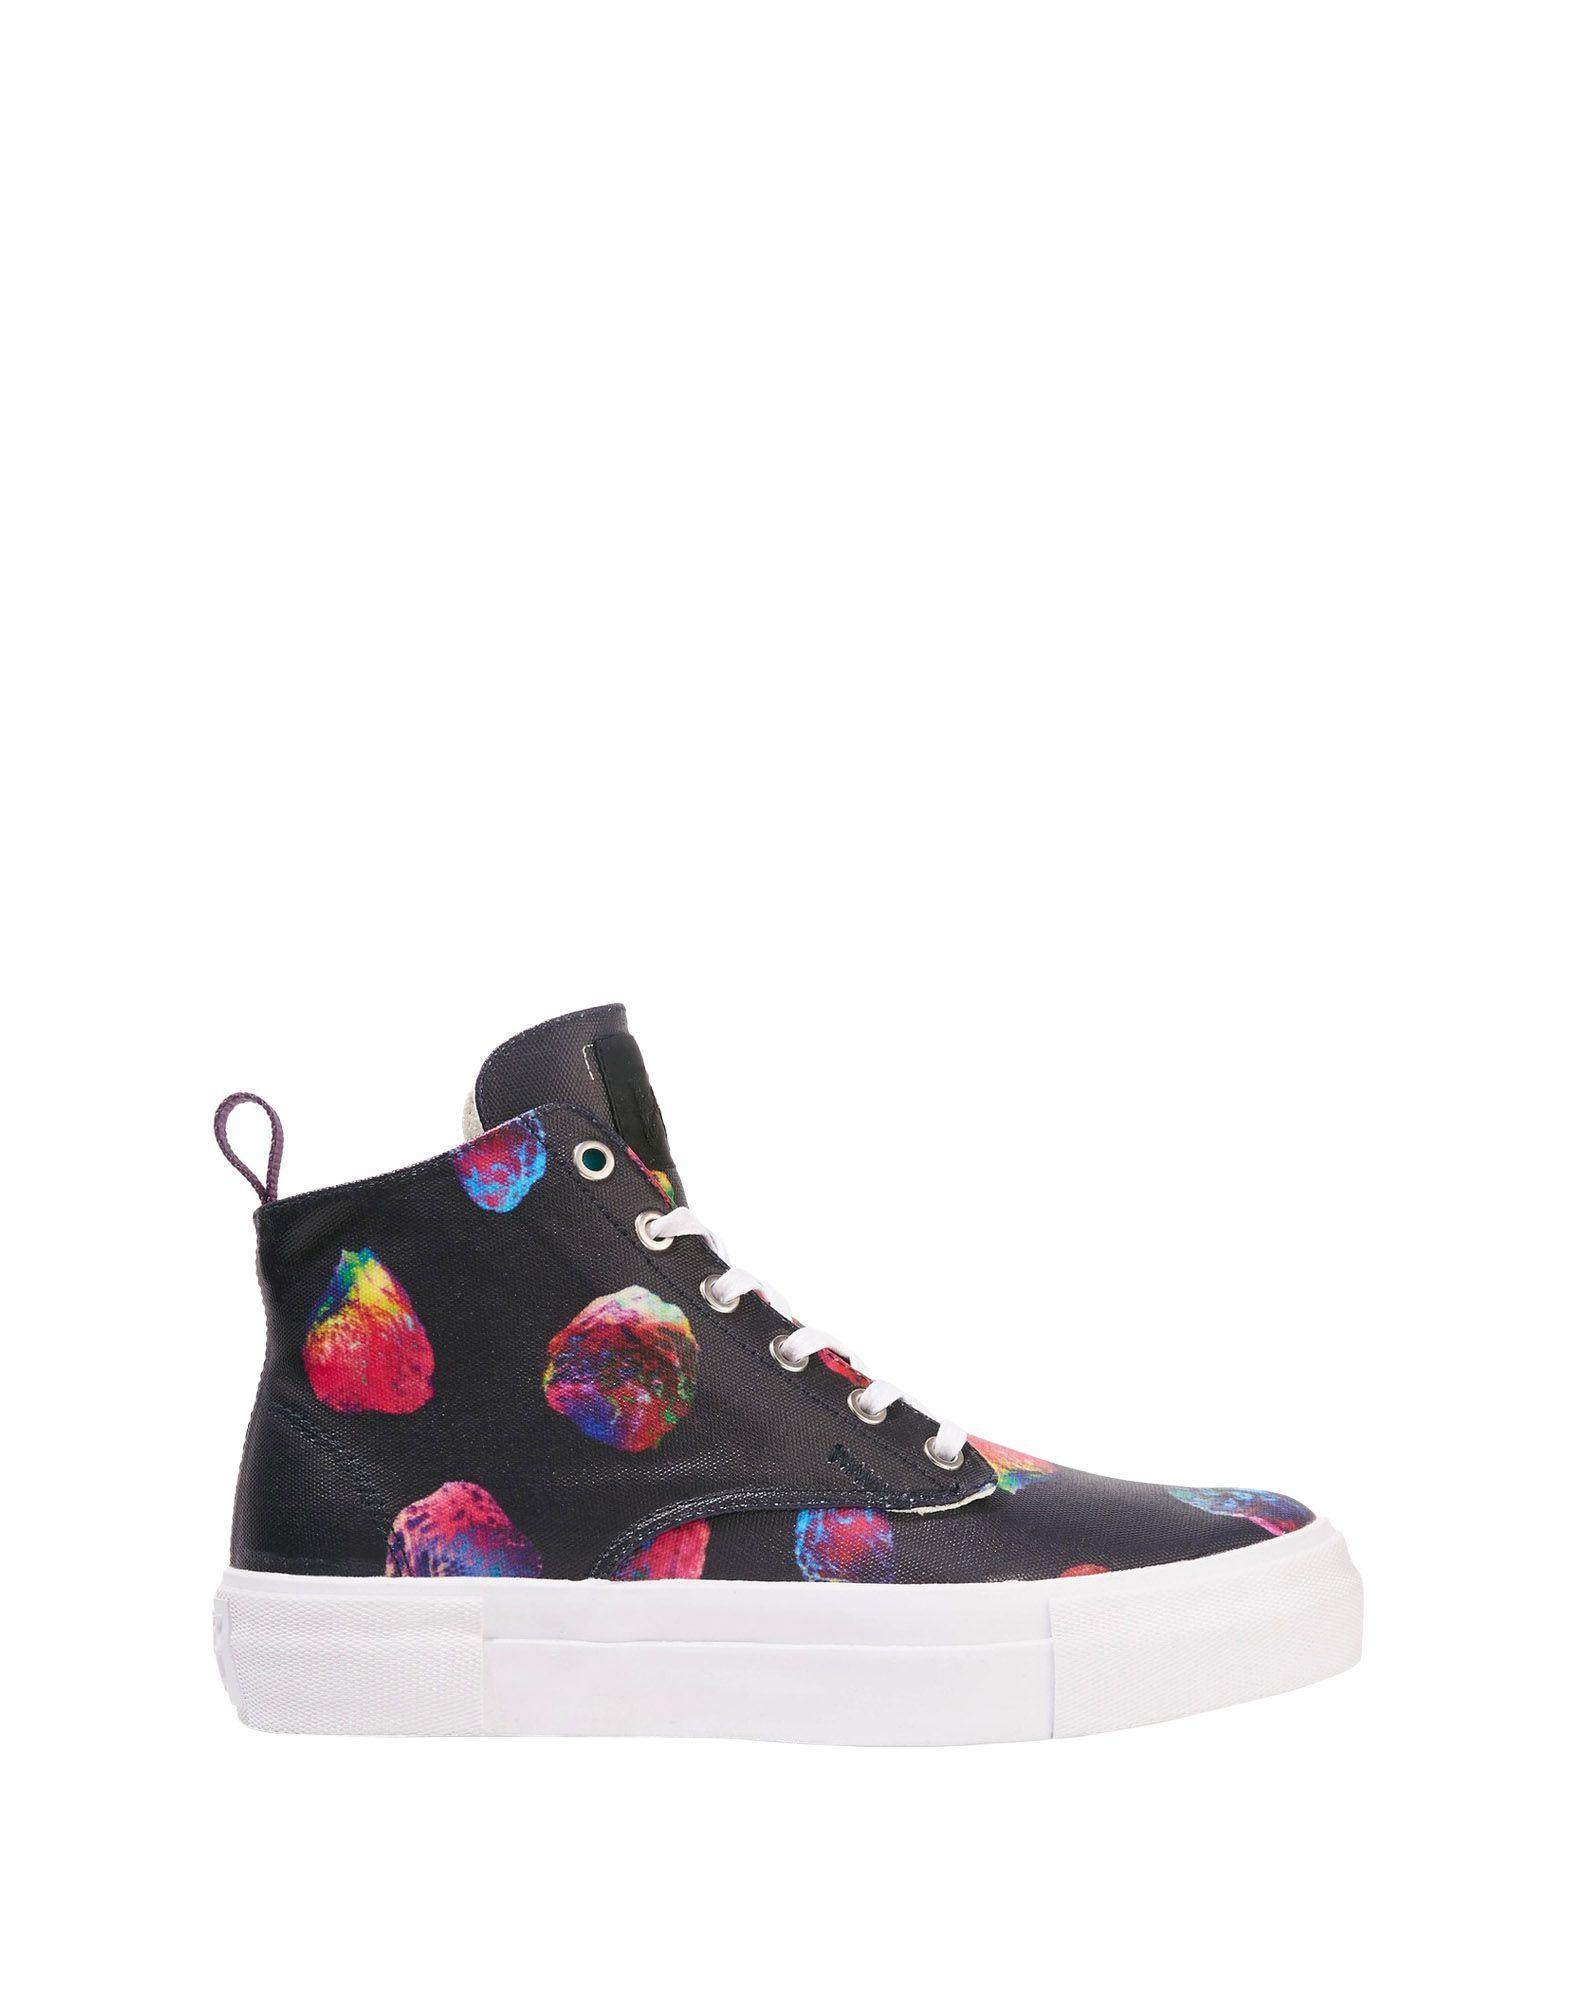 Stilvolle billige  Schuhe Eytys Sneakers Damen  billige 11524370OO 6128b5